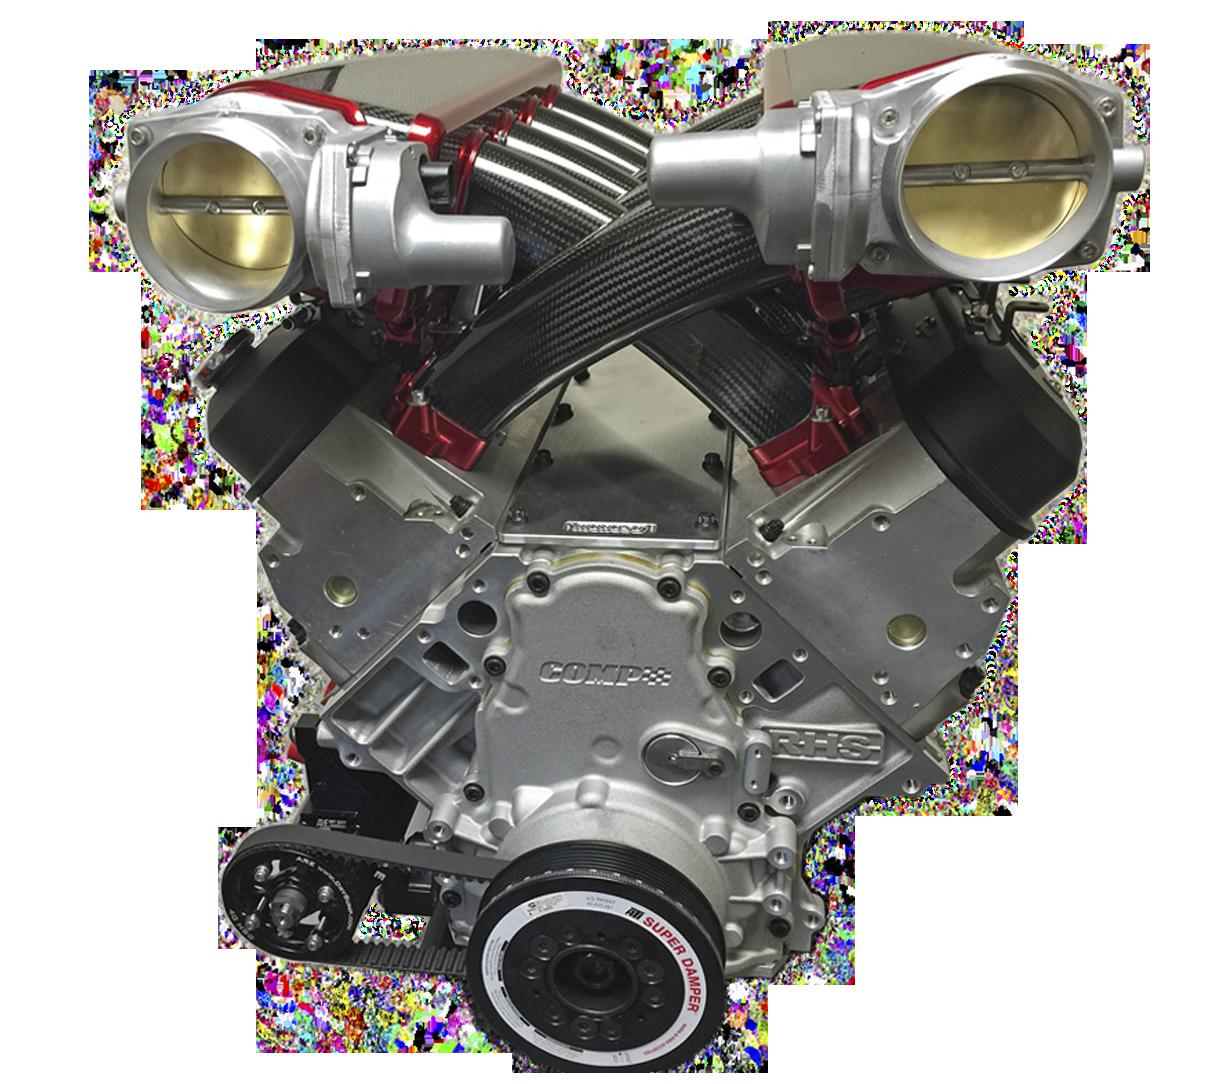 Motors png image purepng. Engine clipart racing engine